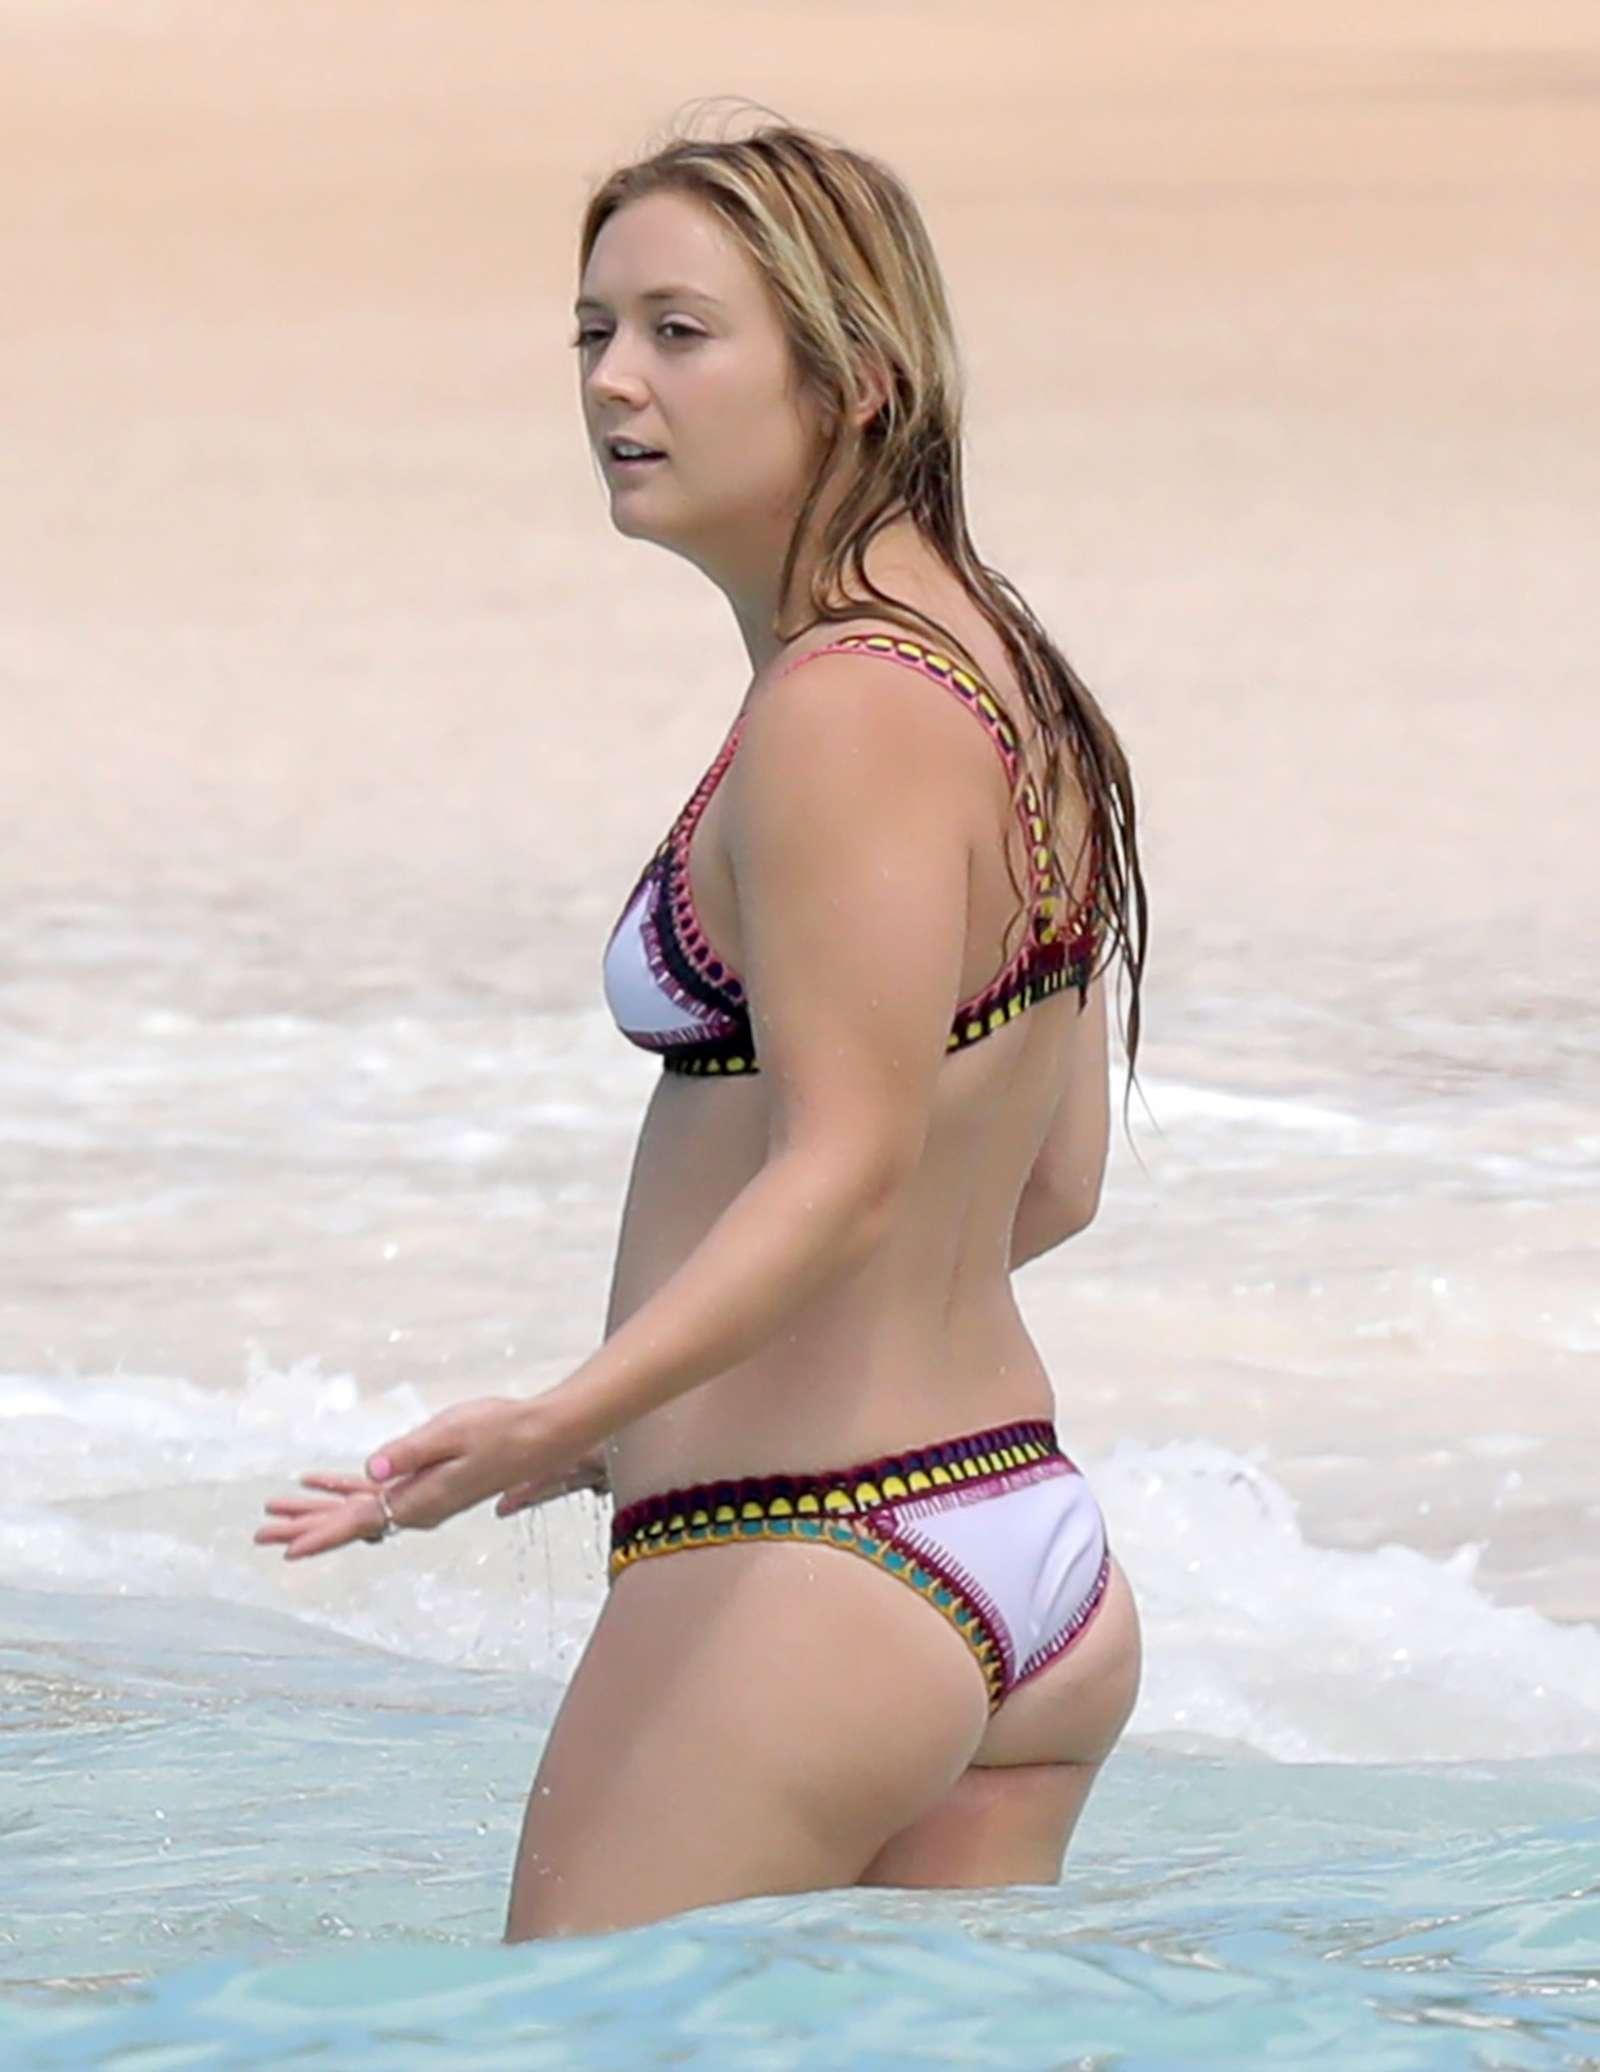 Bikini Billie Lourd nudes (37 photos), Topless